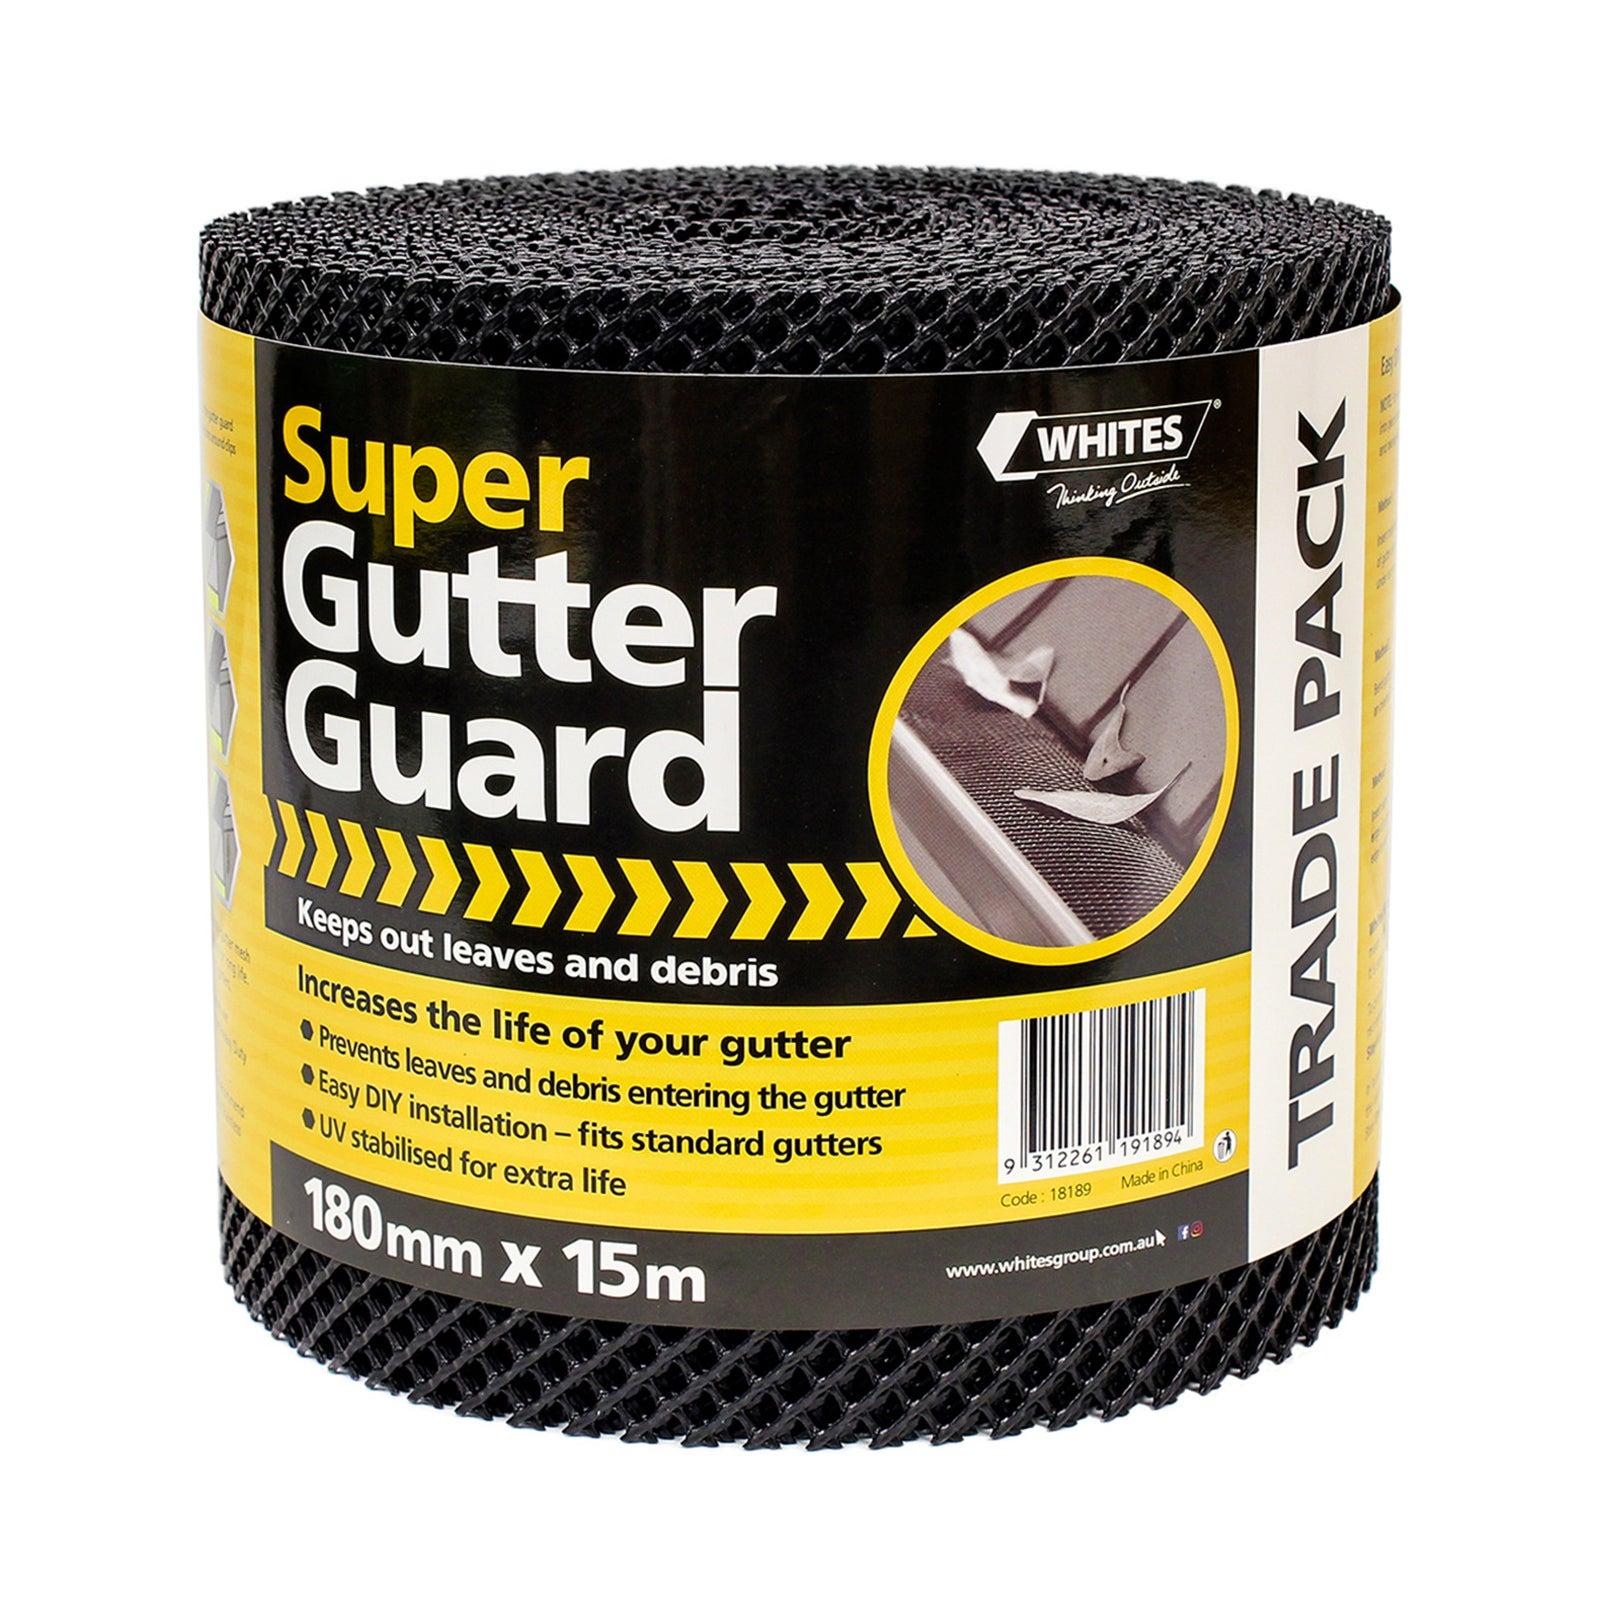 Whites Super Gutter Guard Mesh Roll 180mm x 15m - Black